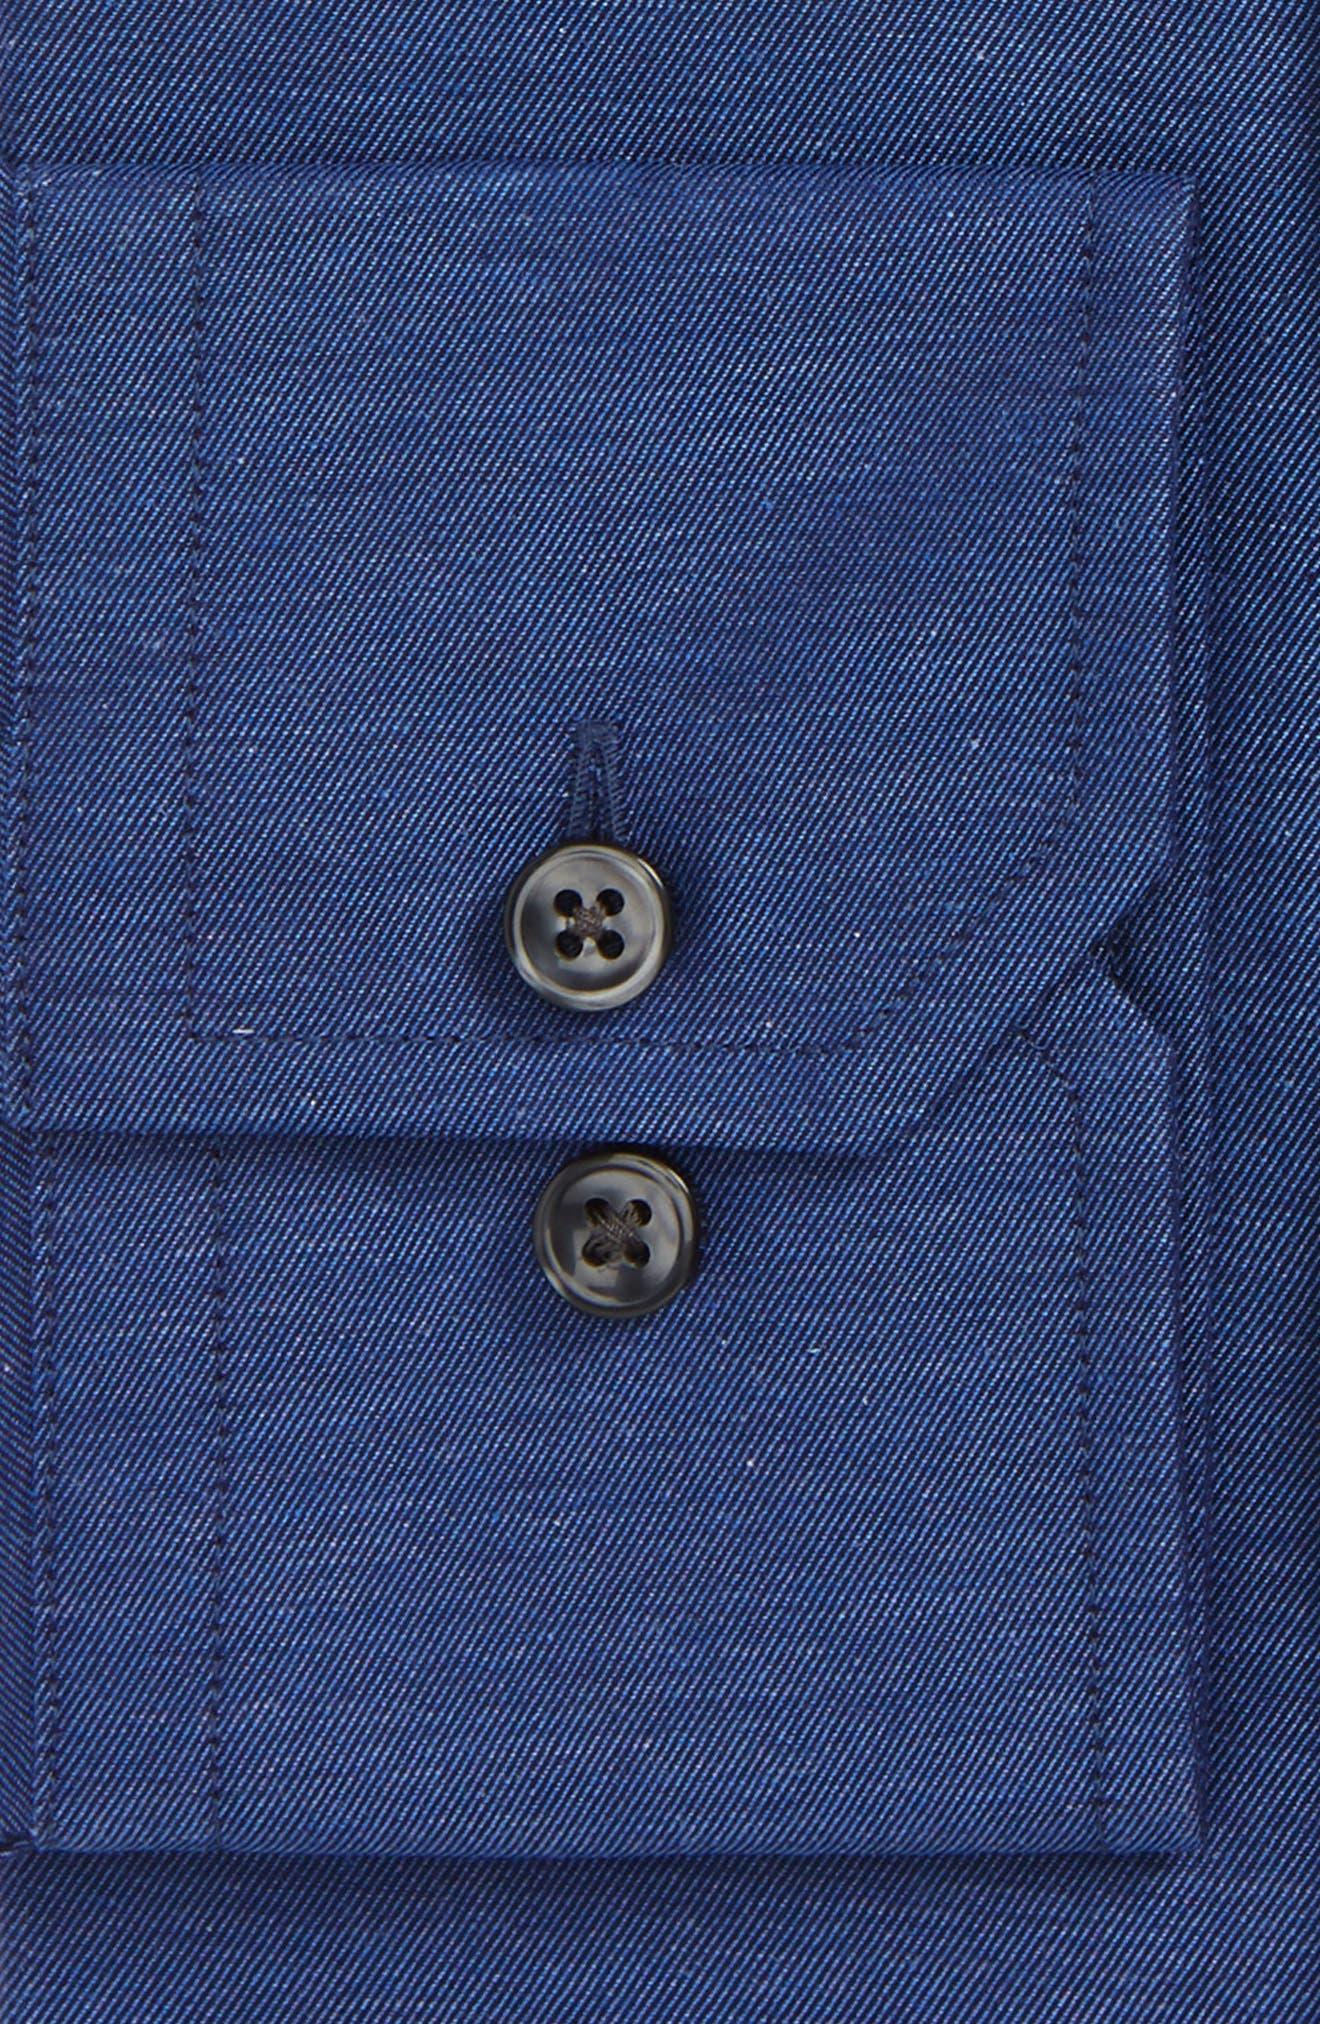 Extra Trim Fit Solid Dress Shirt,                             Alternate thumbnail 2, color,                             414